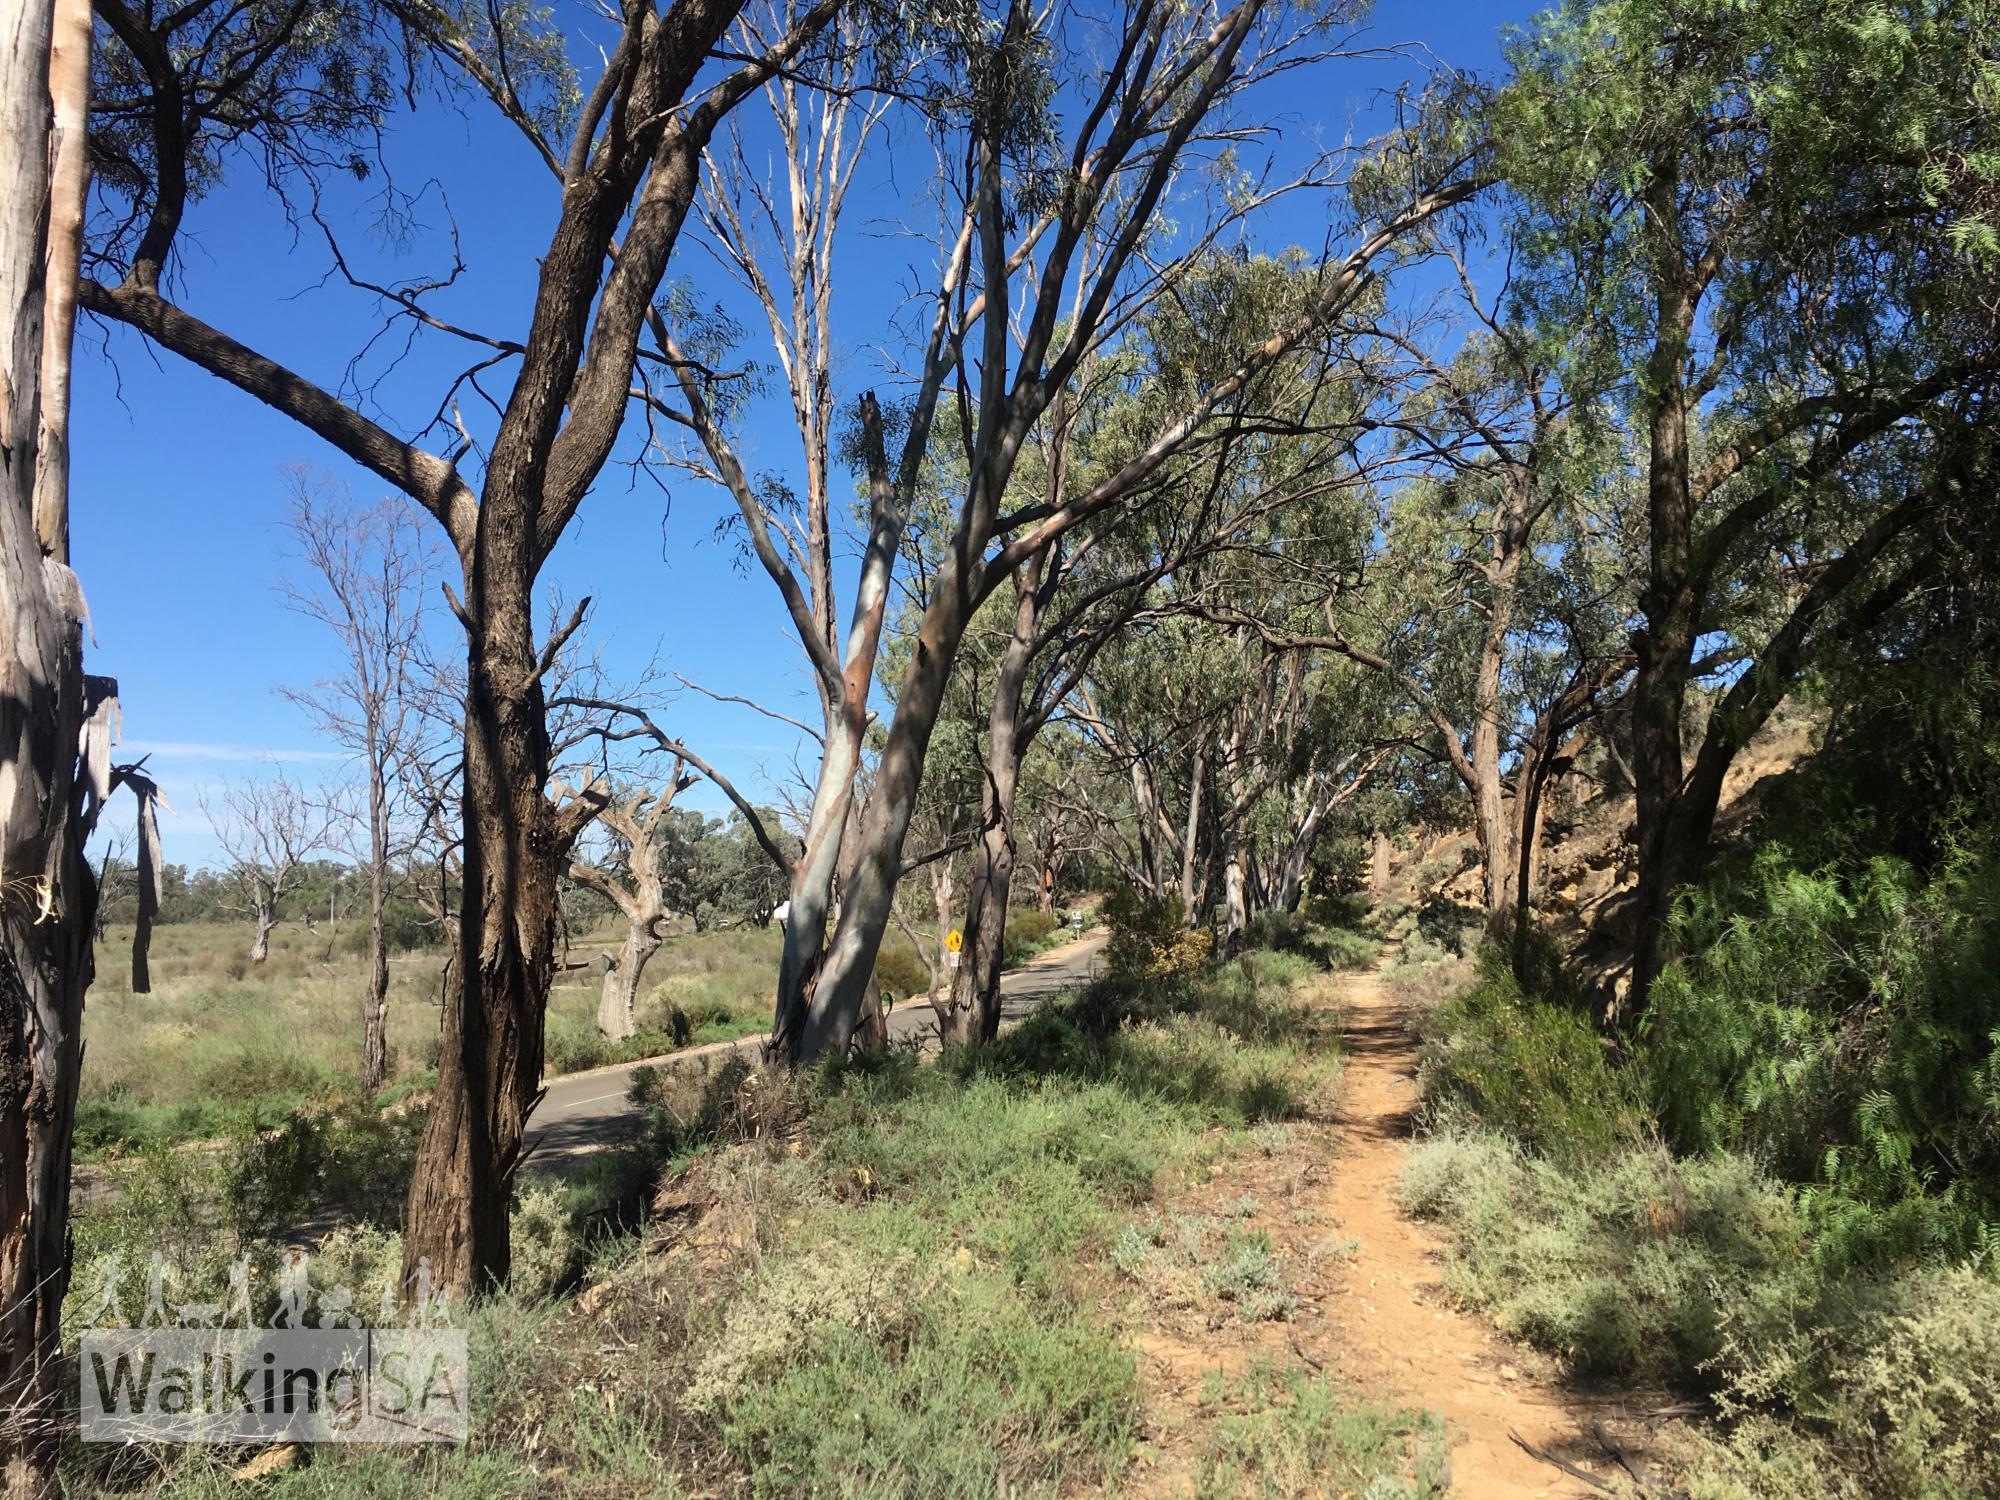 Overland Corner Walking Trails   3 Hiking Trails   Walking SA